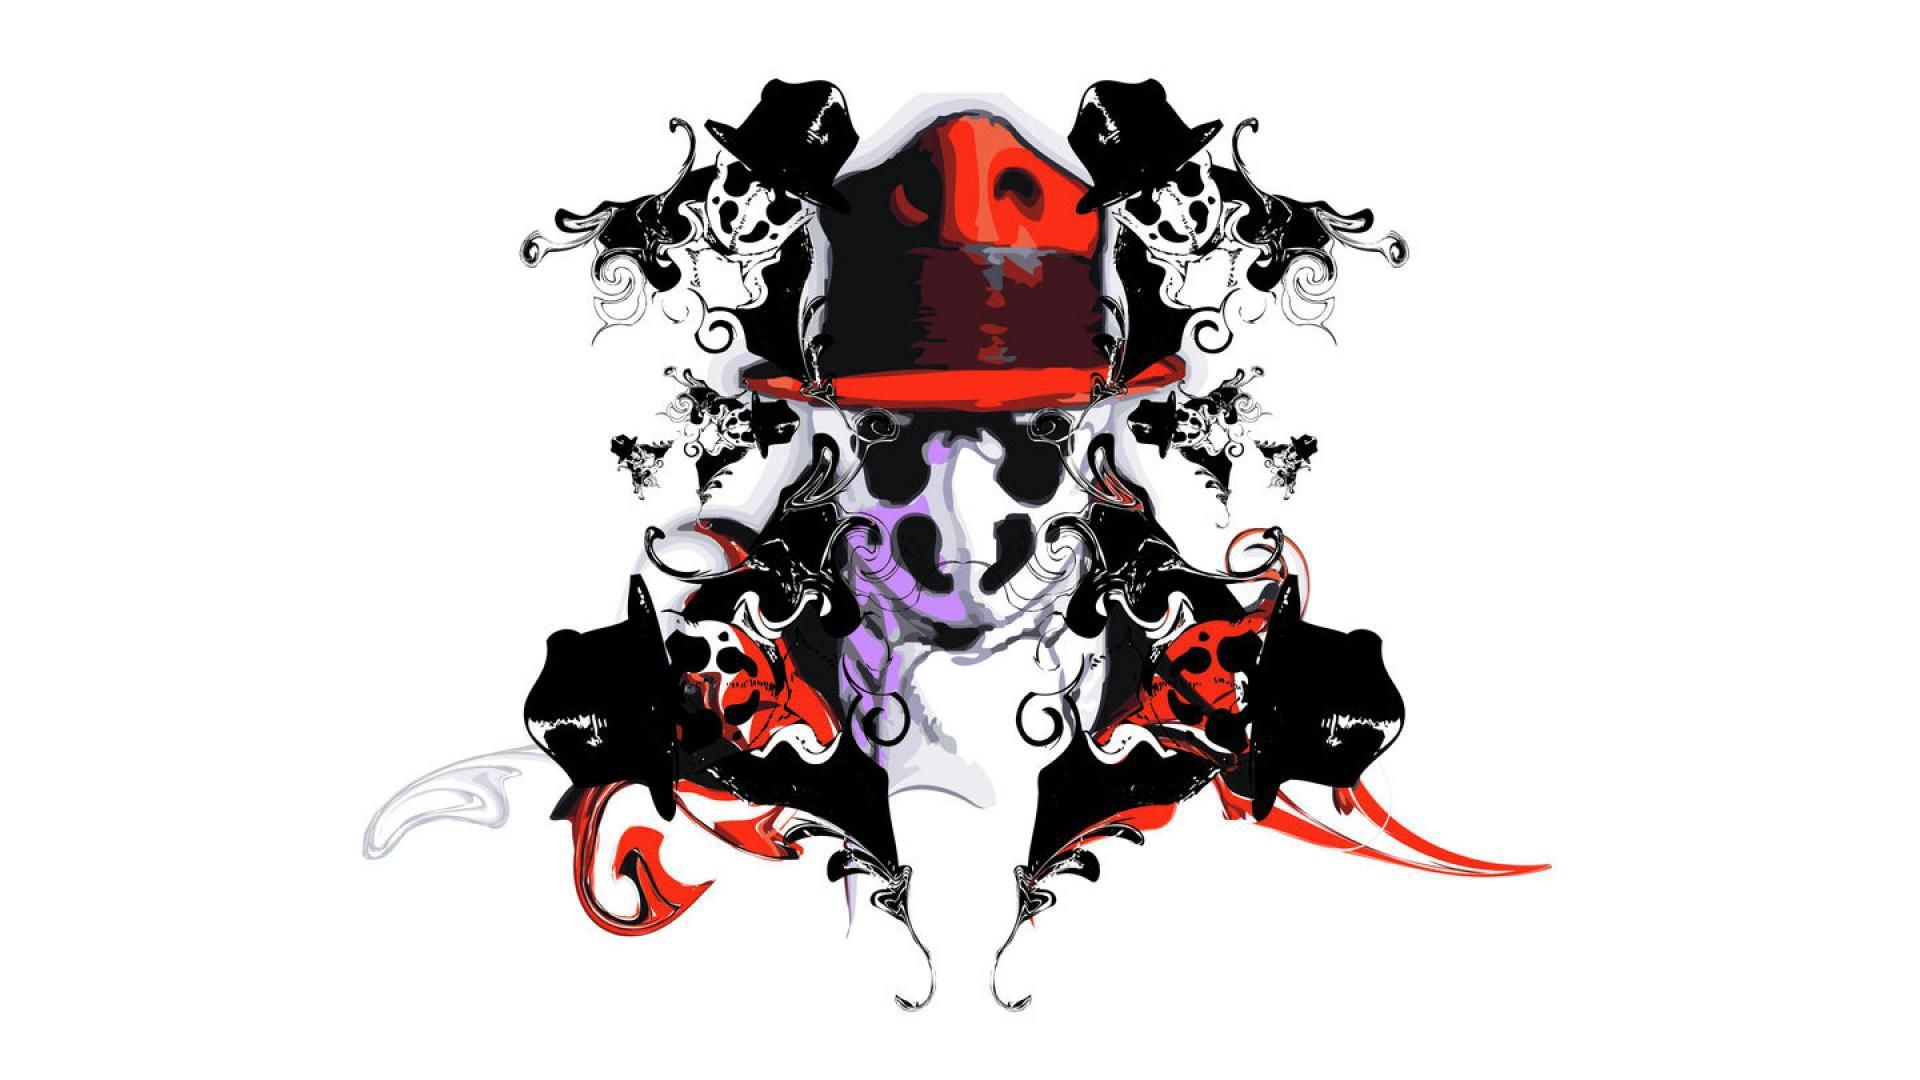 Rorschach desktop